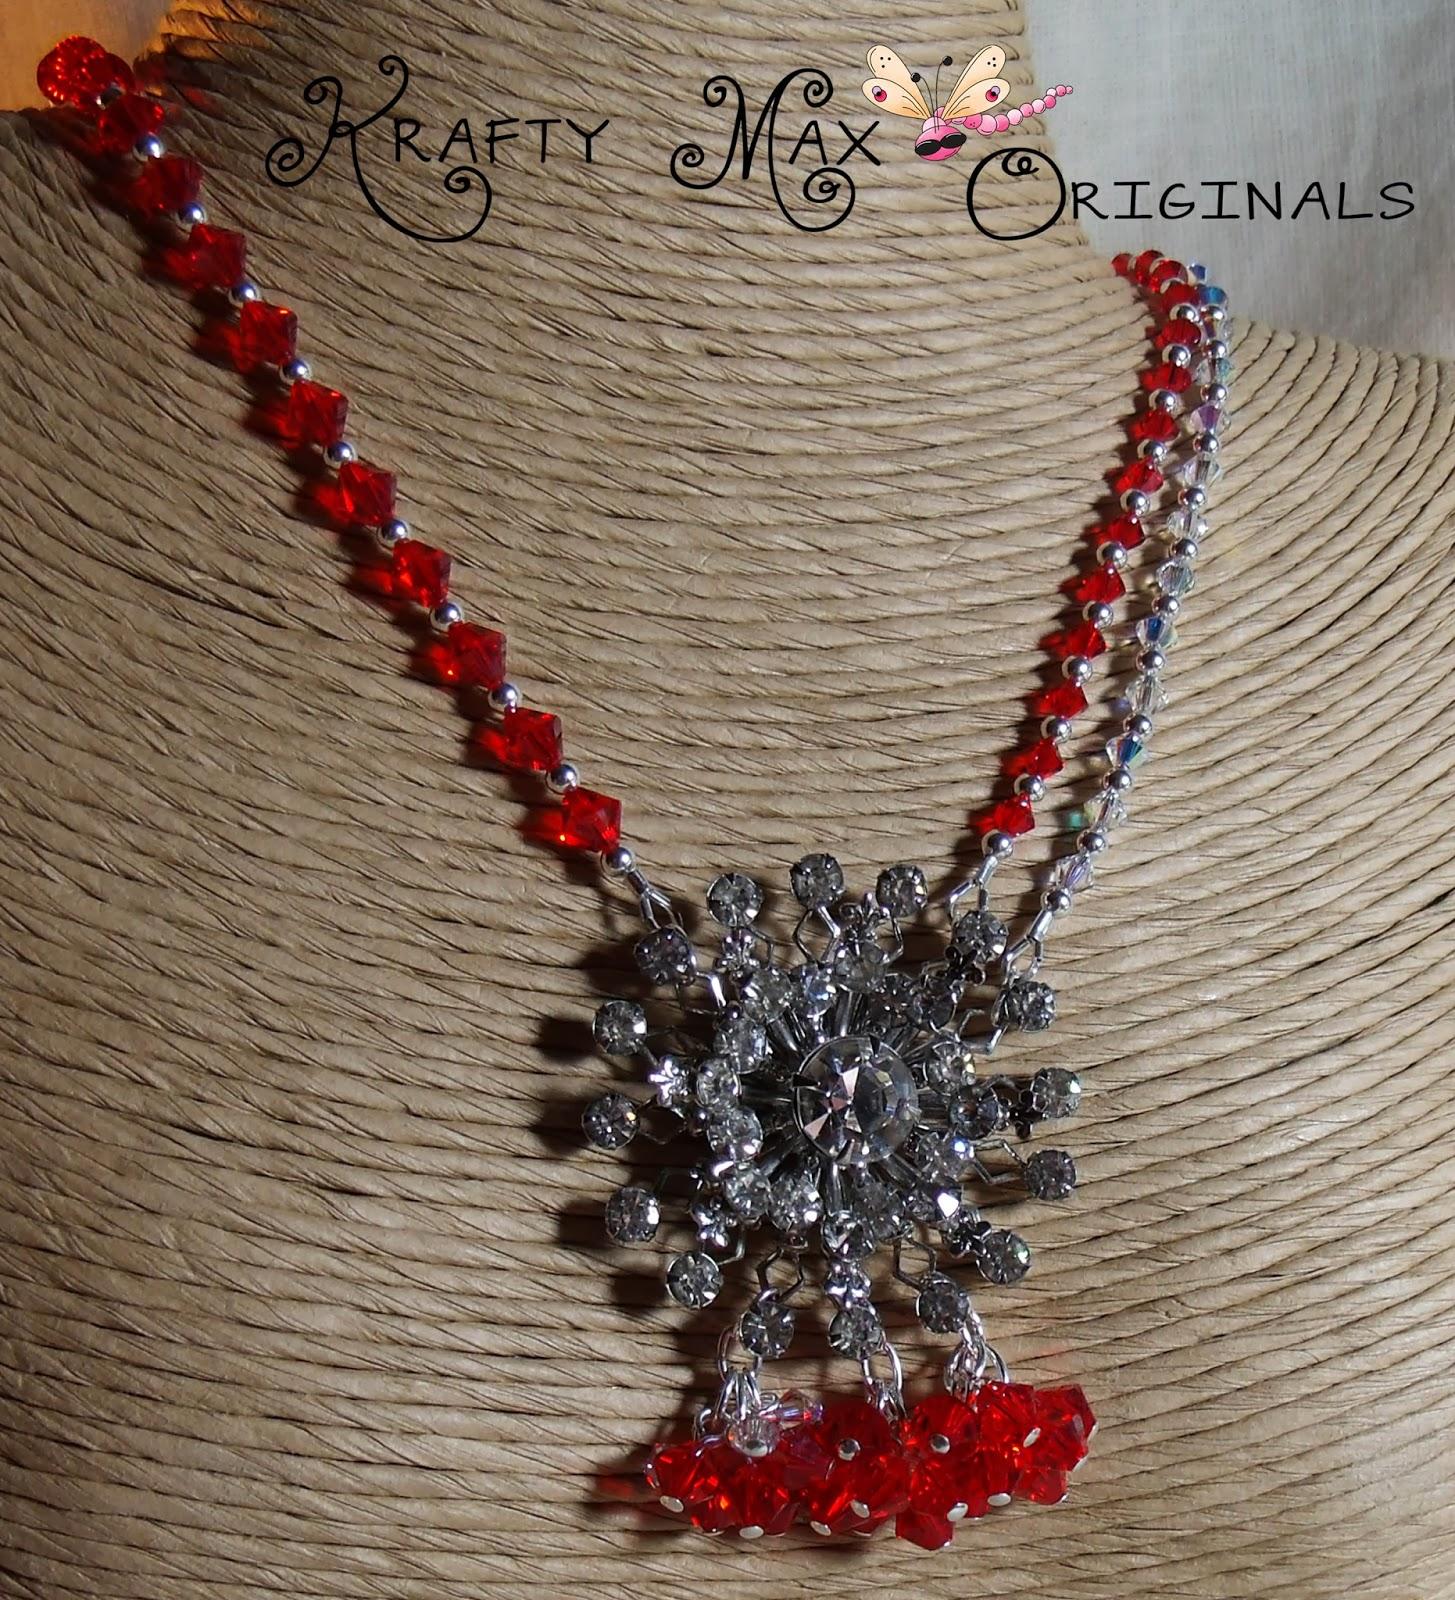 www.artfire.com/ext/shop/product_view/KraftyMax/4583522/Red_and_Swarovski_Crystal_StarBURST_Necklace_Set/Jewelry/Sets/Crystal